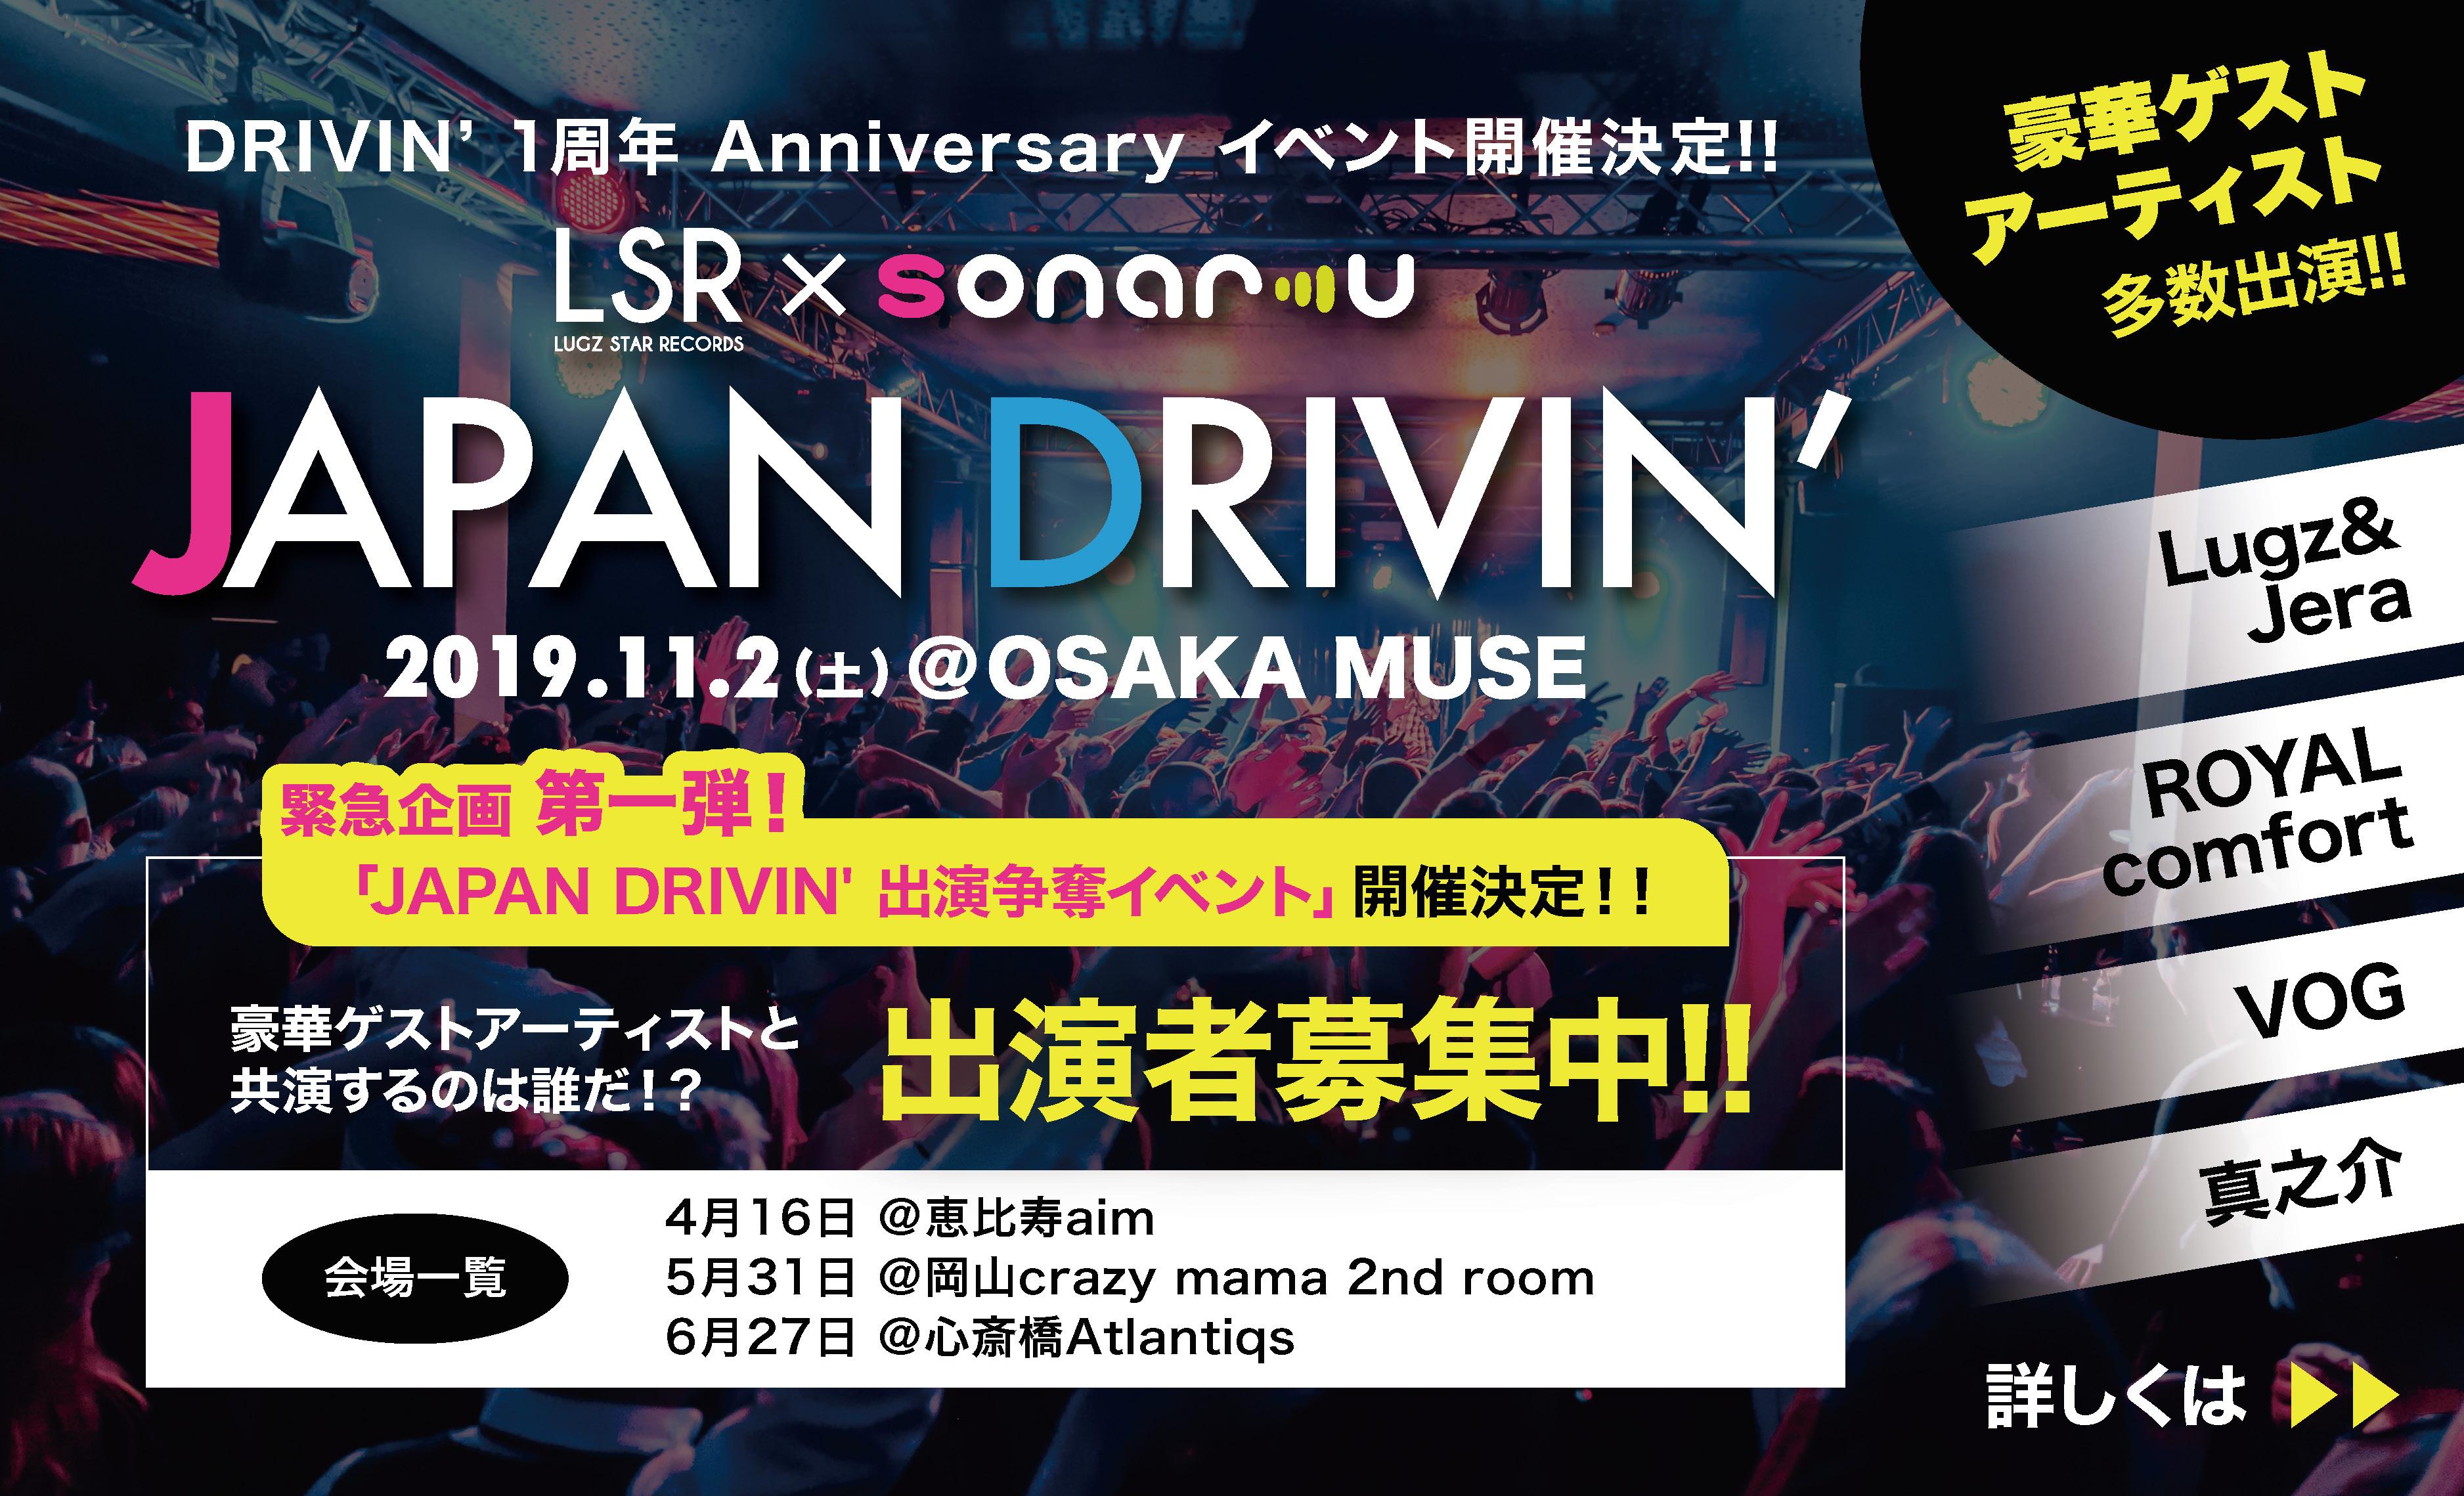 JAPAN DRIVIN